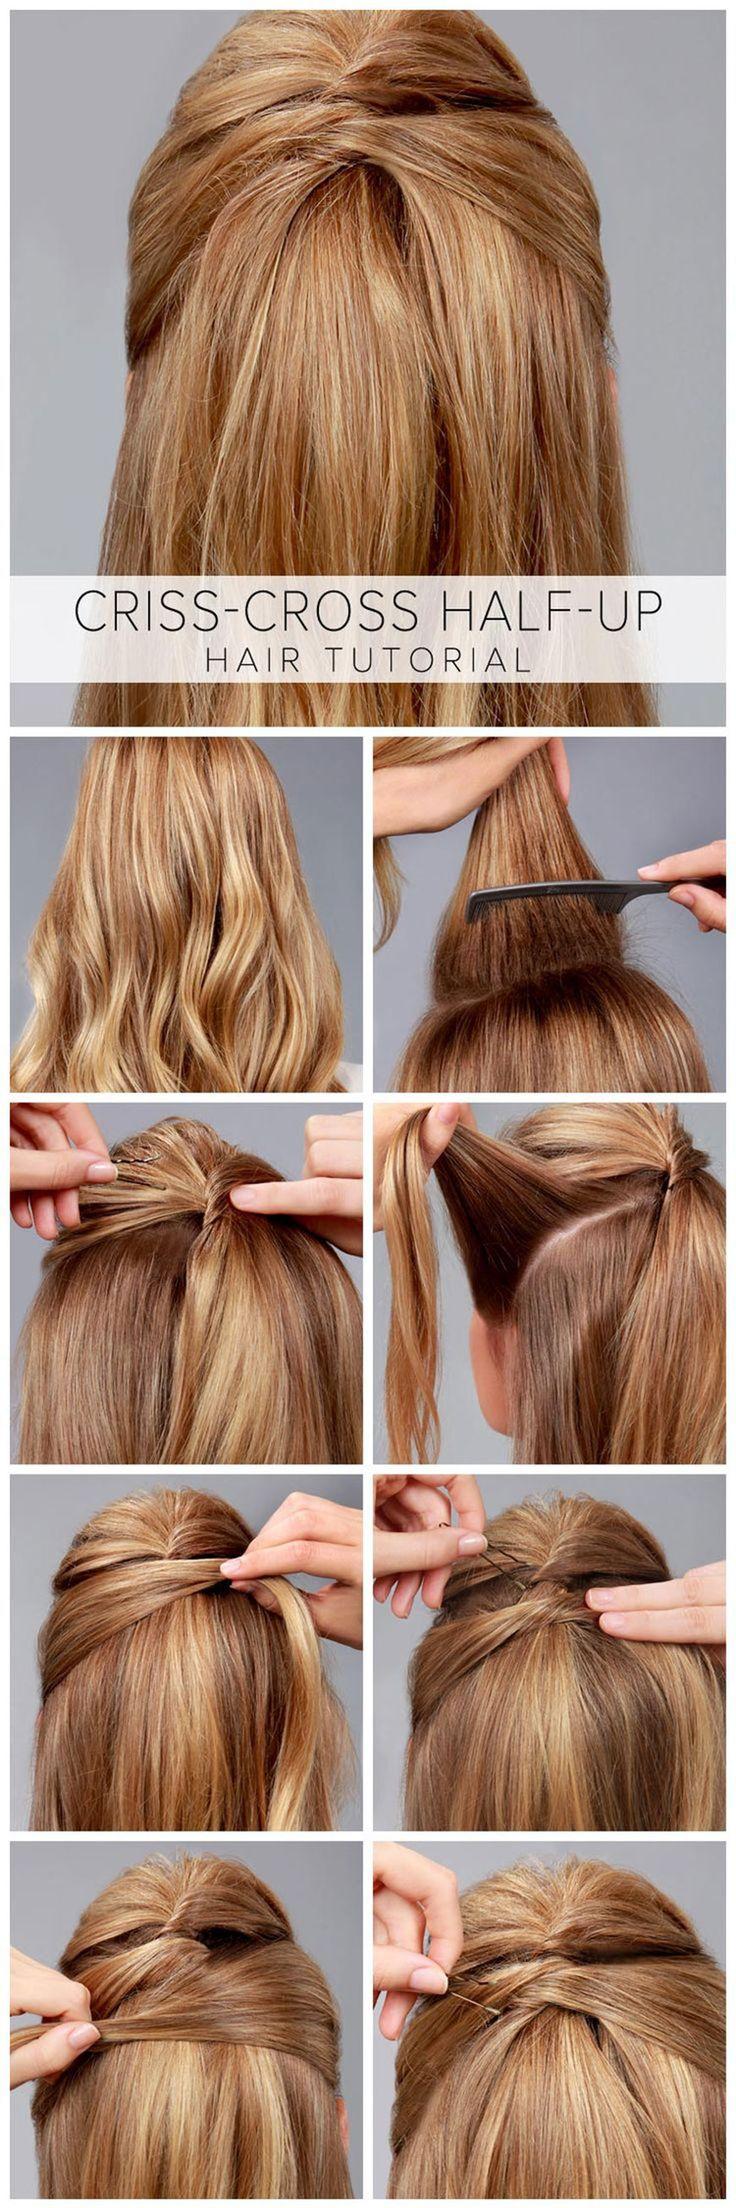 Wondrous 1000 Ideas About Easy Wedding Hairstyles On Pinterest Short Short Hairstyles Gunalazisus